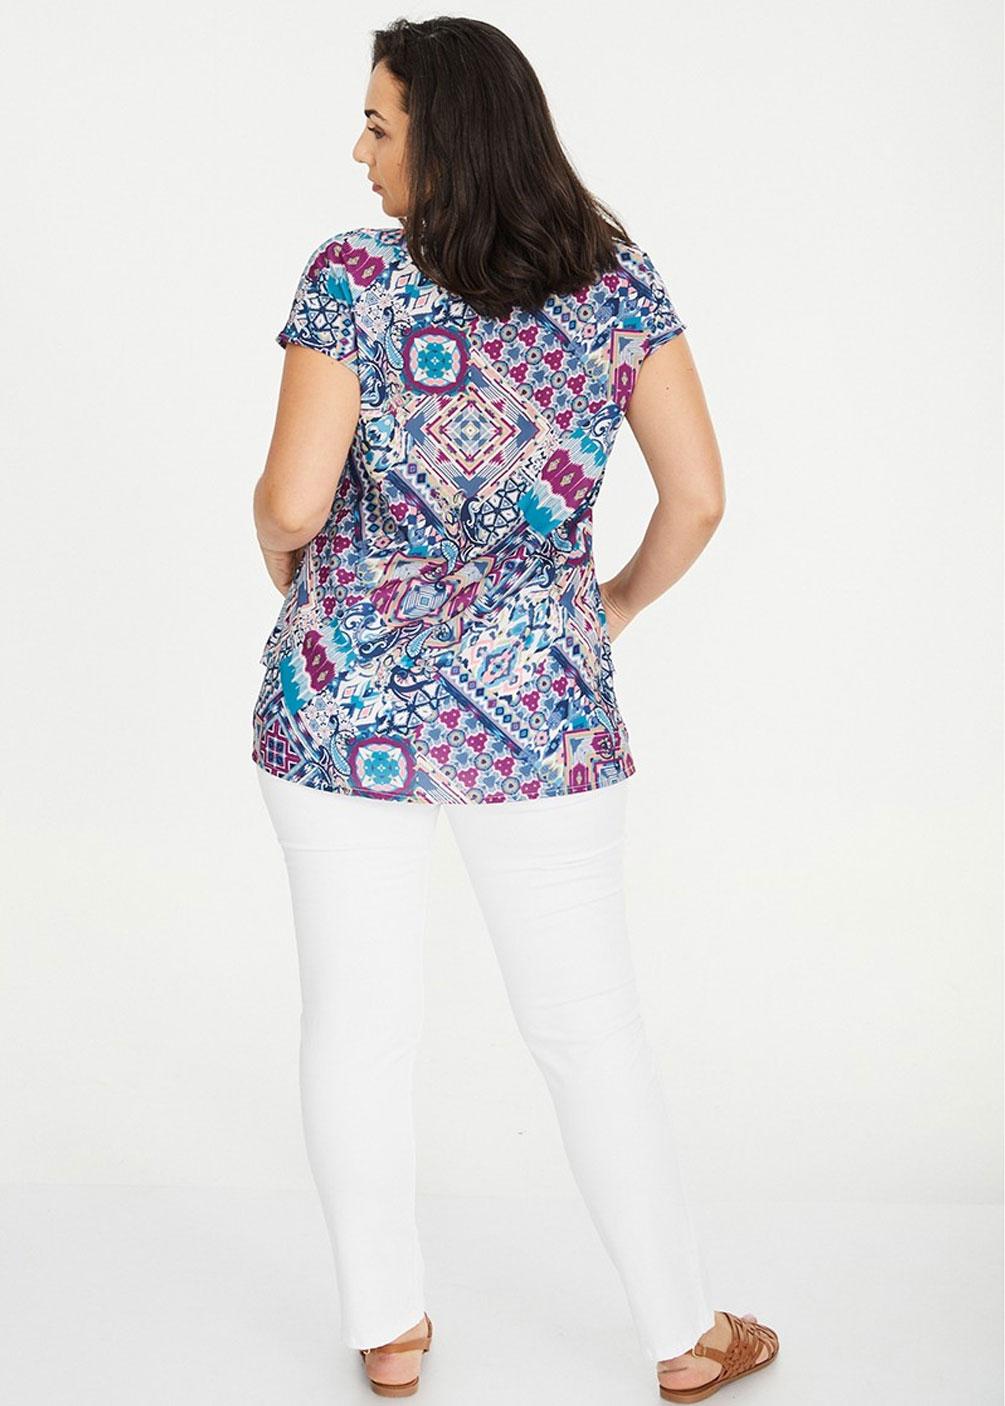 top tallas grandes marca spg indra carisal